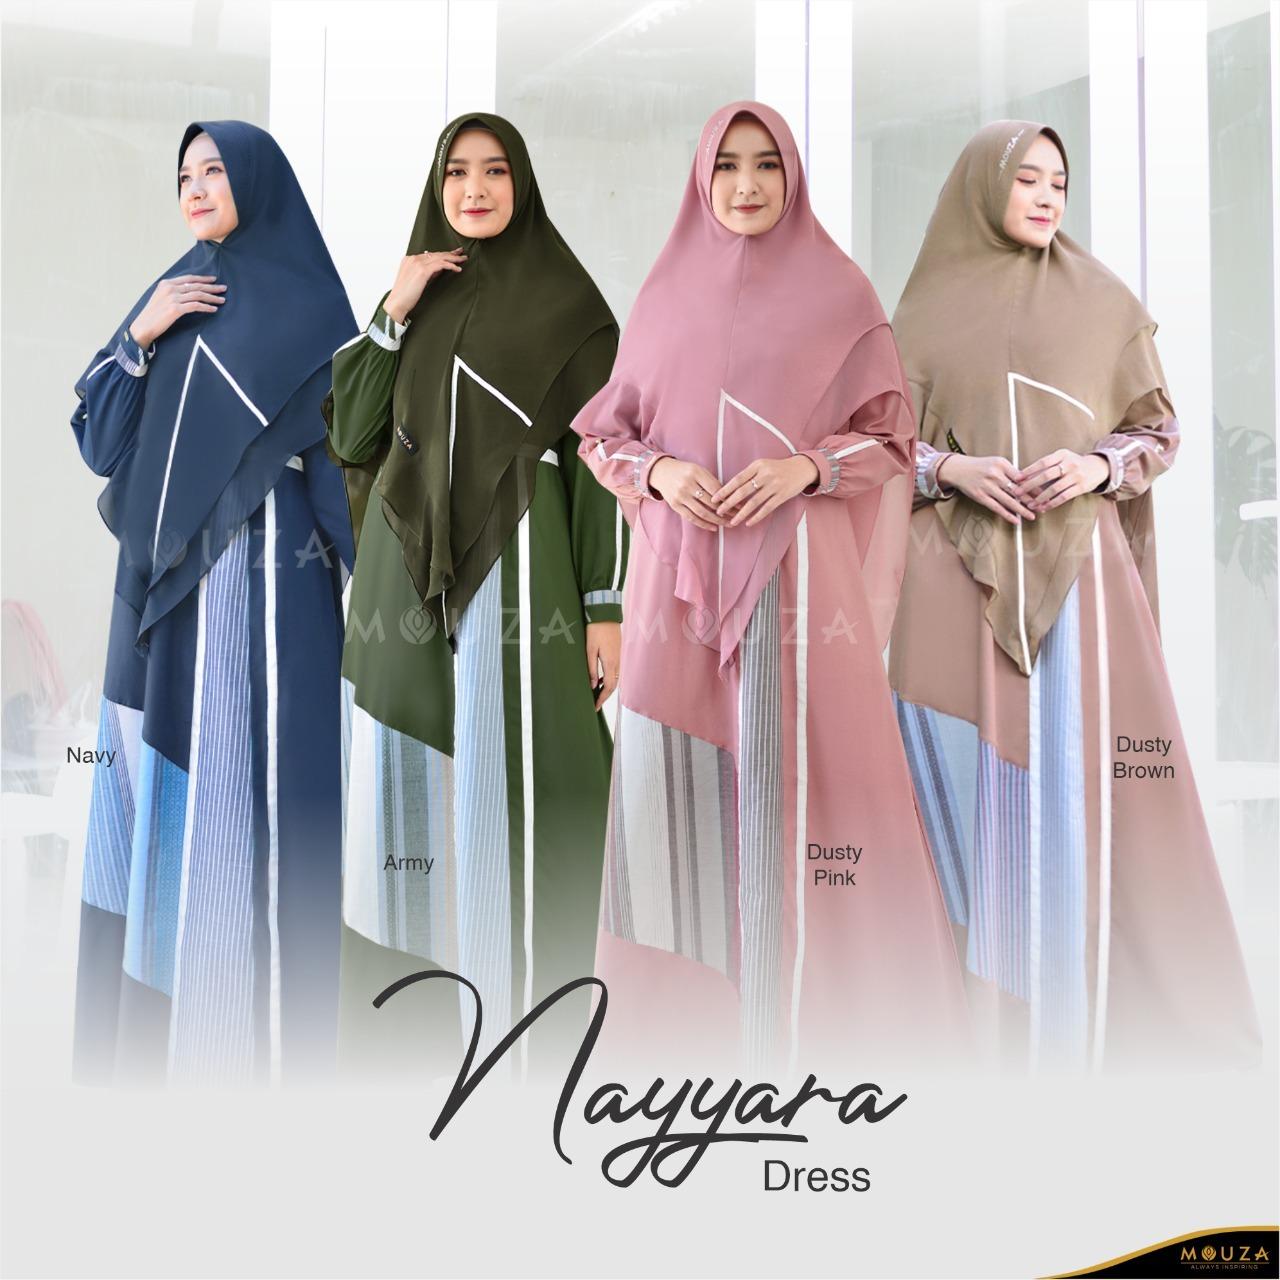 Nayyara Dress